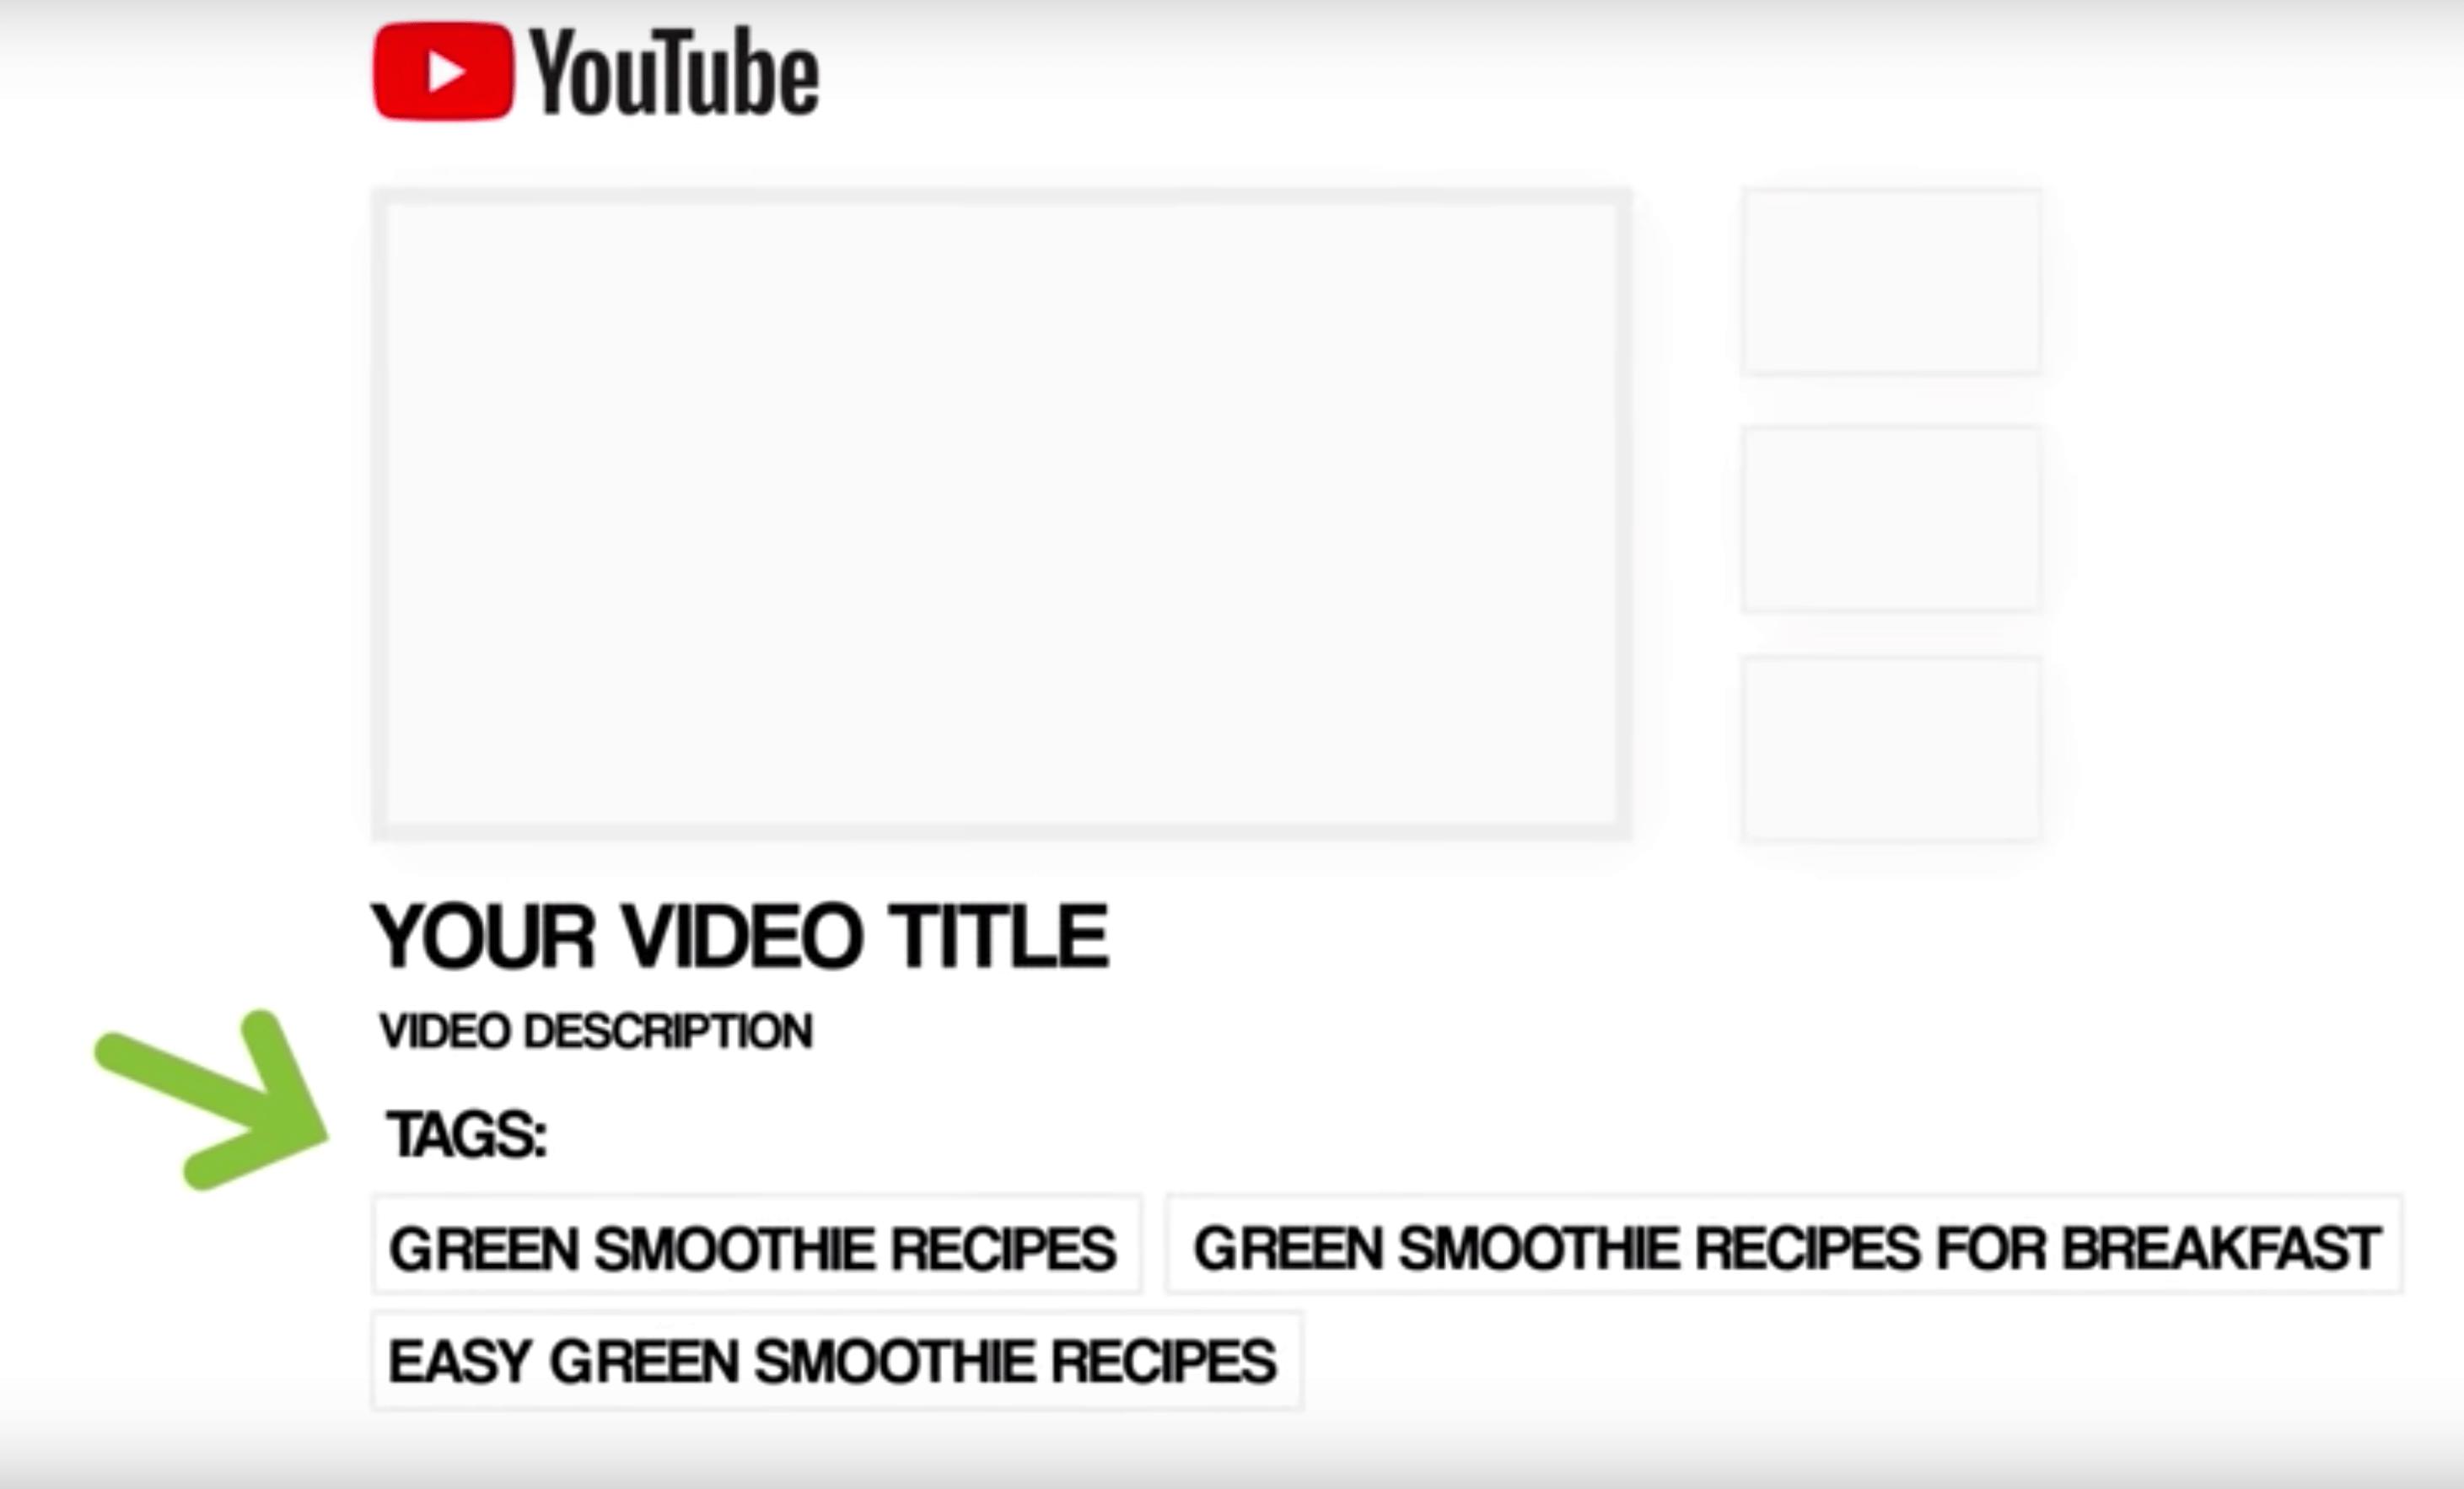 youtube-seo-tips-tags